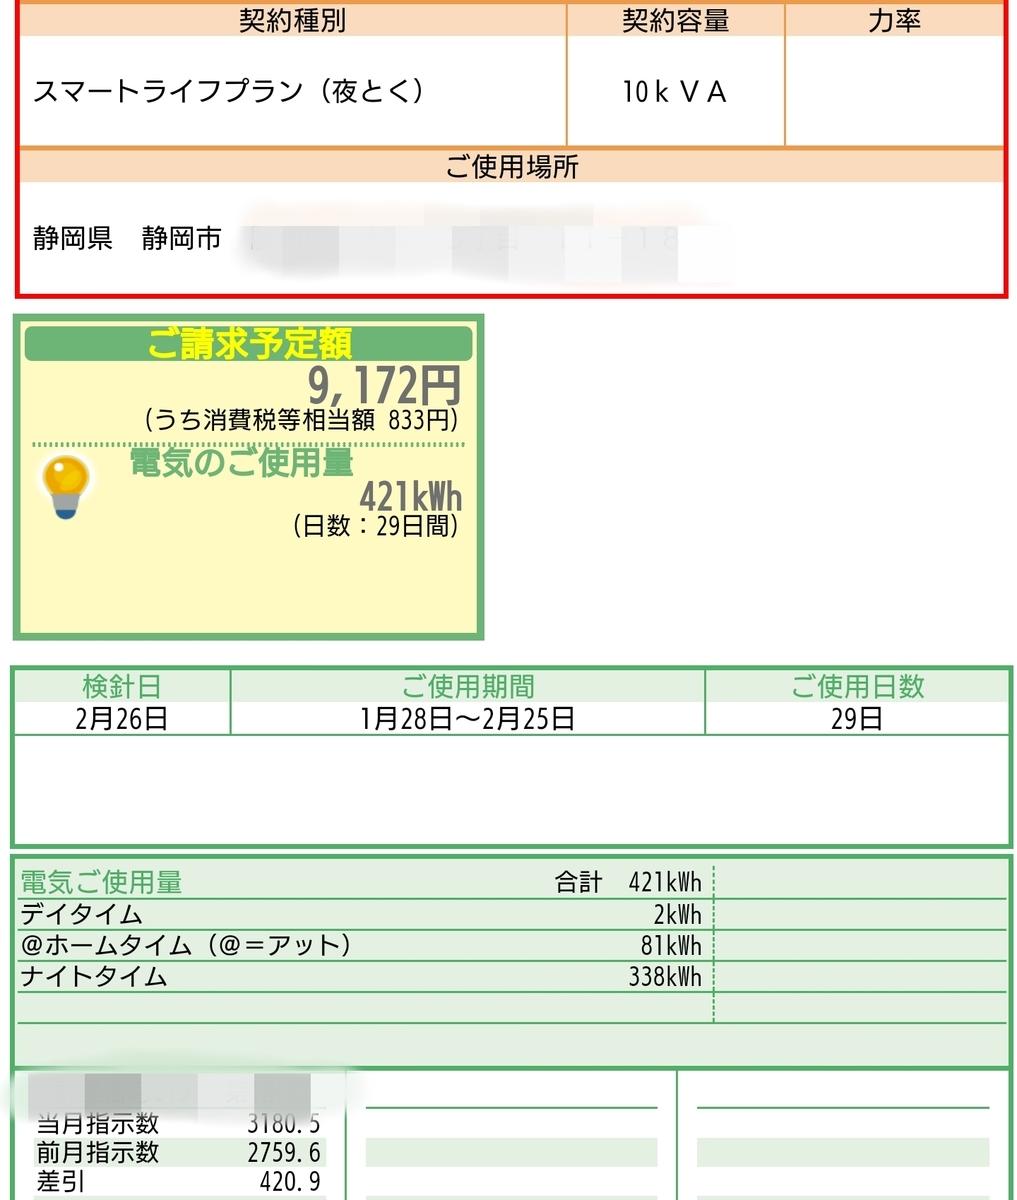 f:id:Sayacchi:20200317232146j:plain